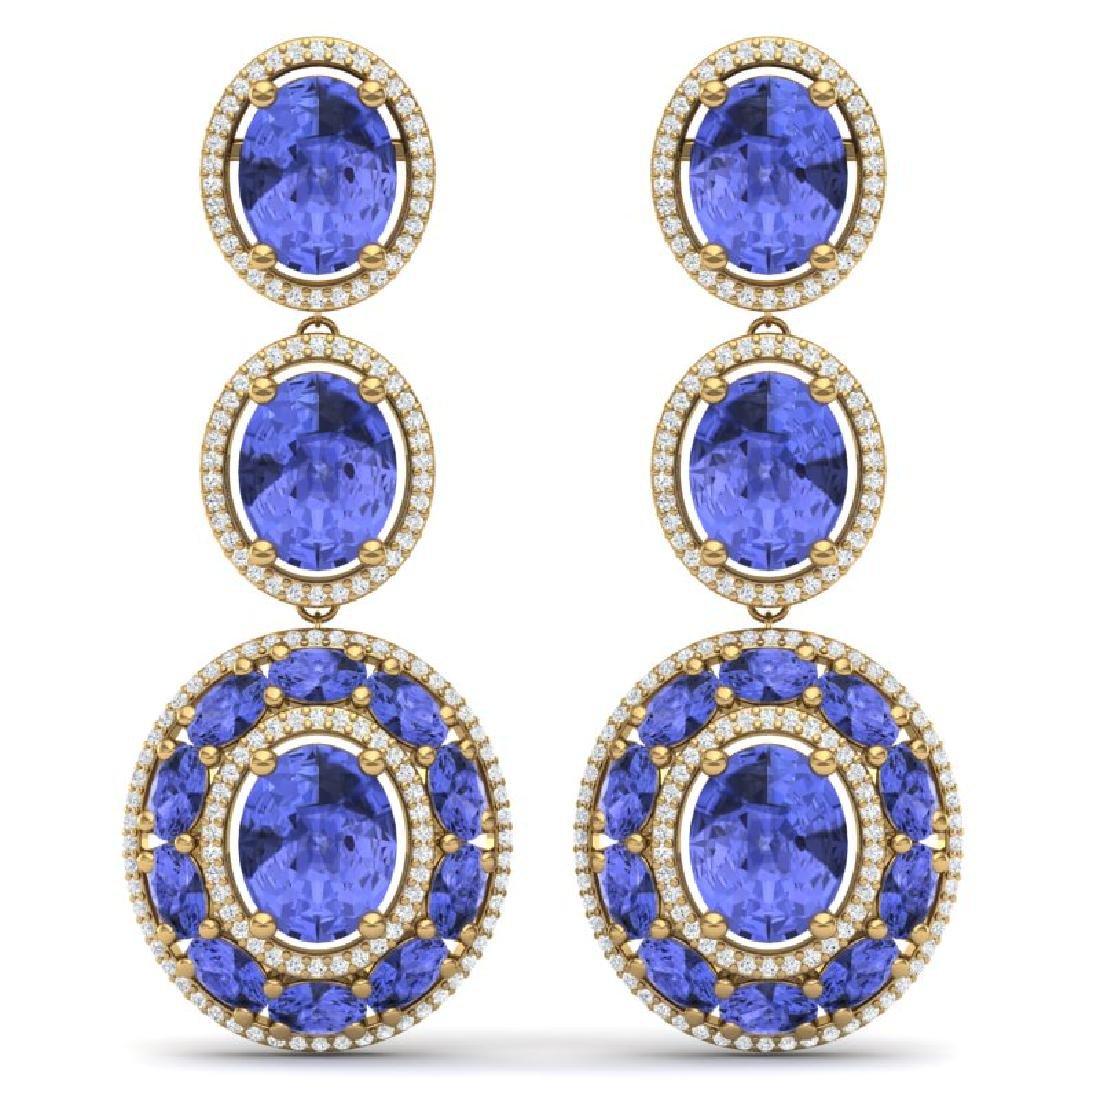 33.72 CTW Royalty Tanzanite & VS Diamond Earrings 18K